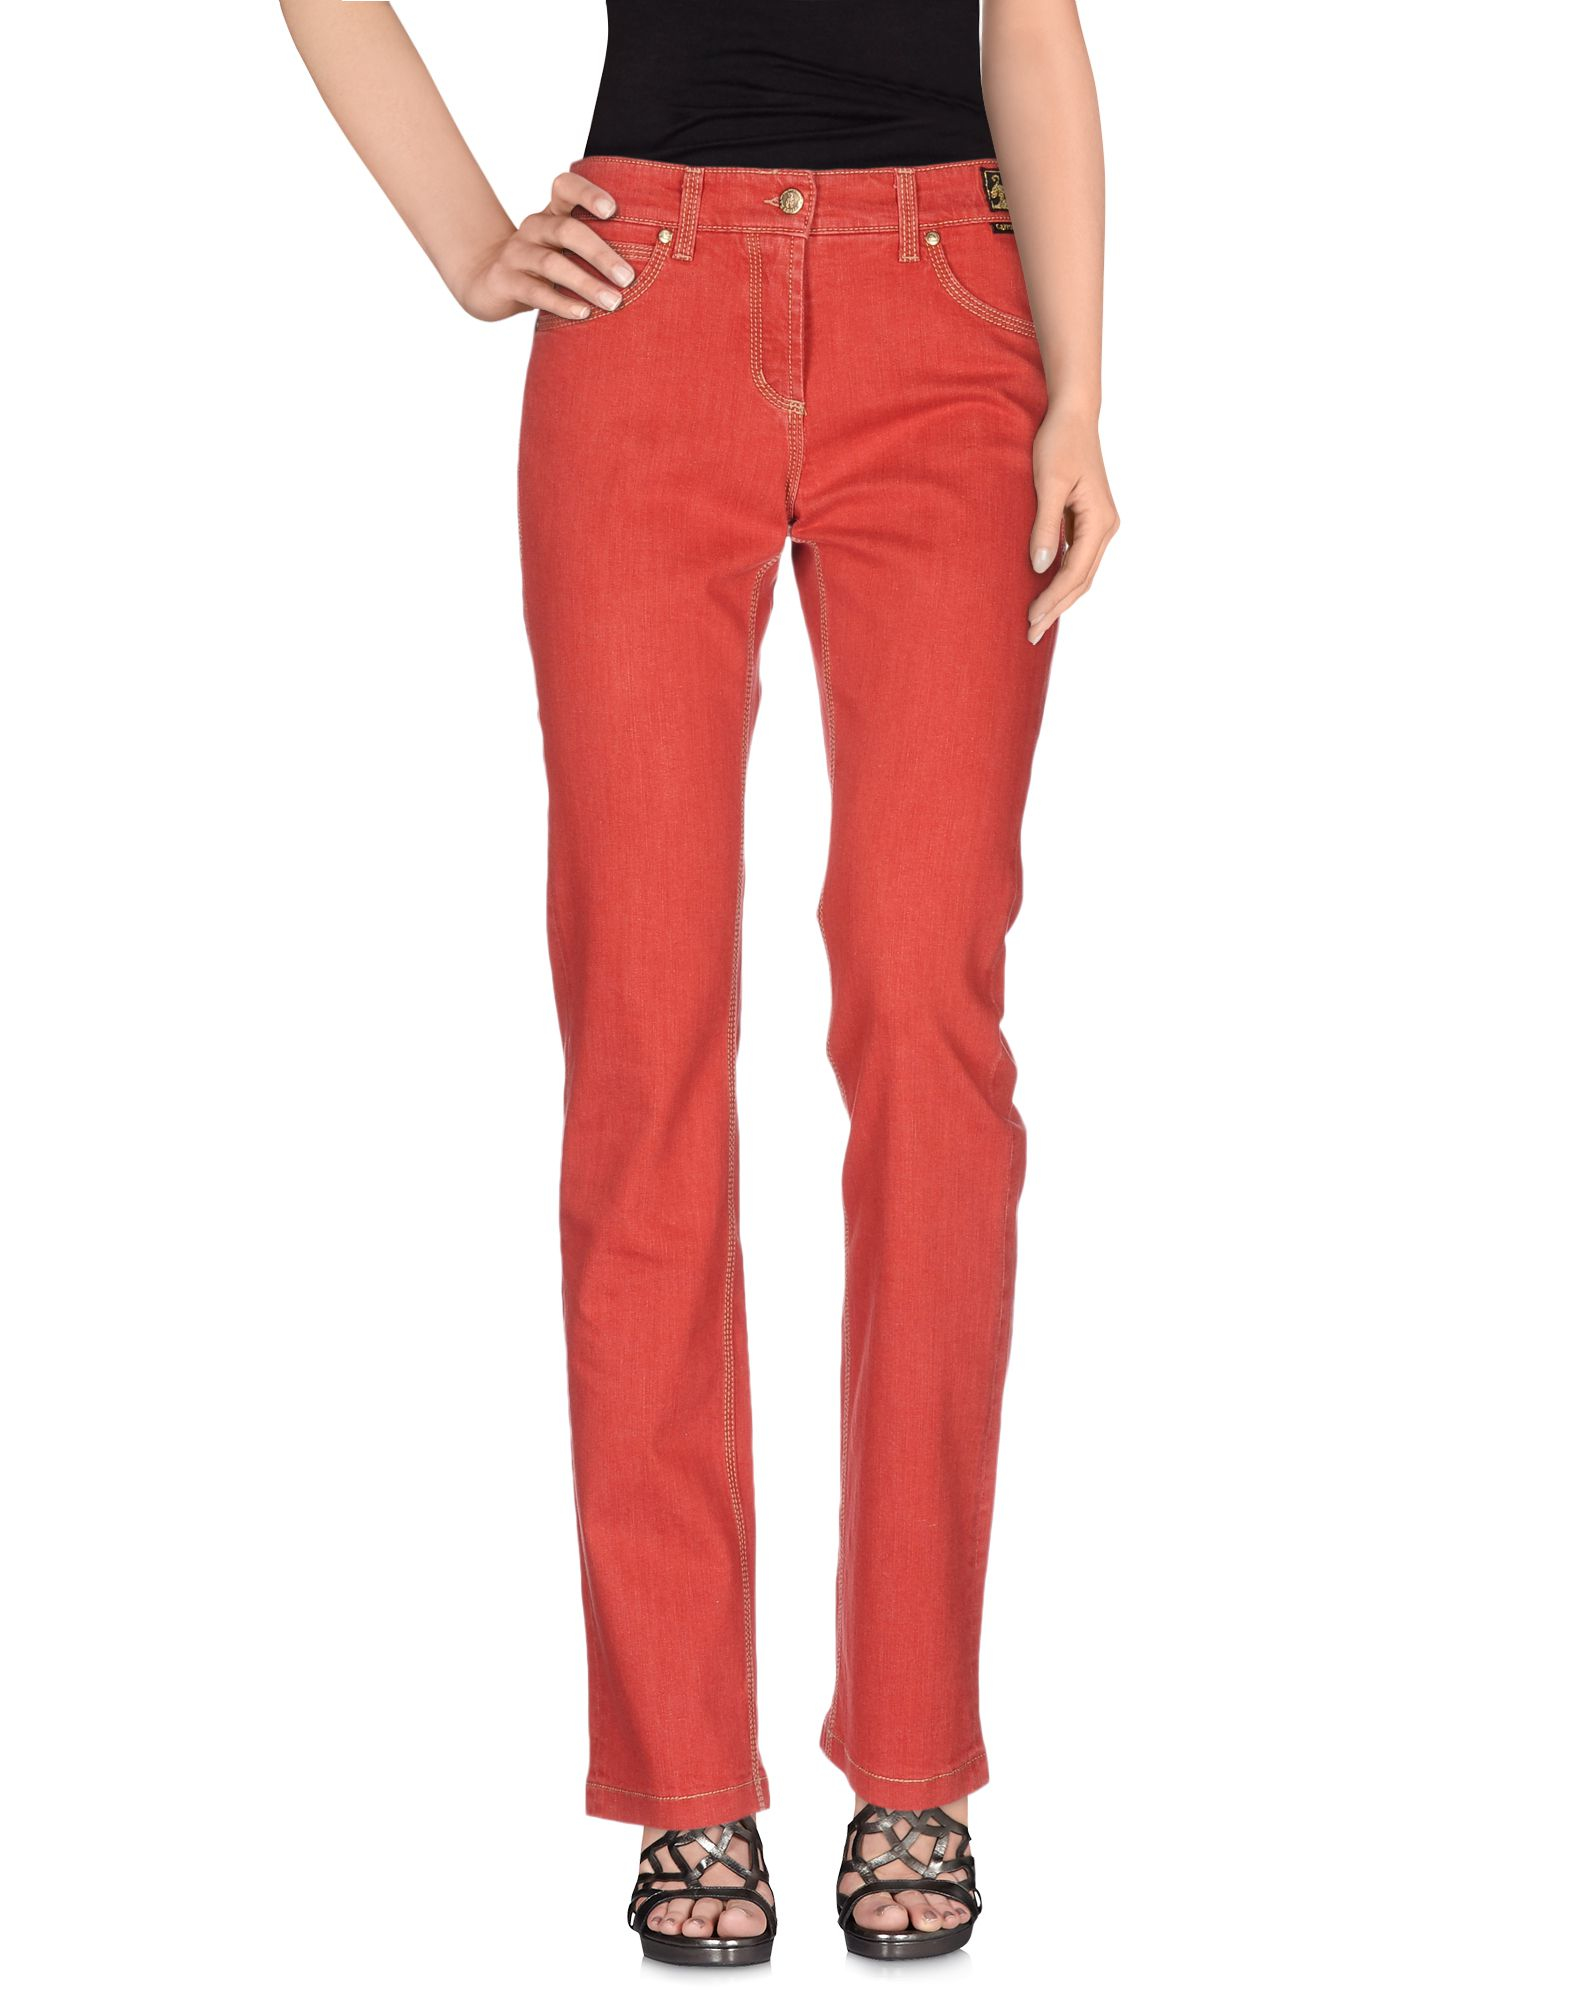 Cheap Clearance Store DENIM - Denim trousers Cappopera Geniue Stockist Sale Online rTFahELe